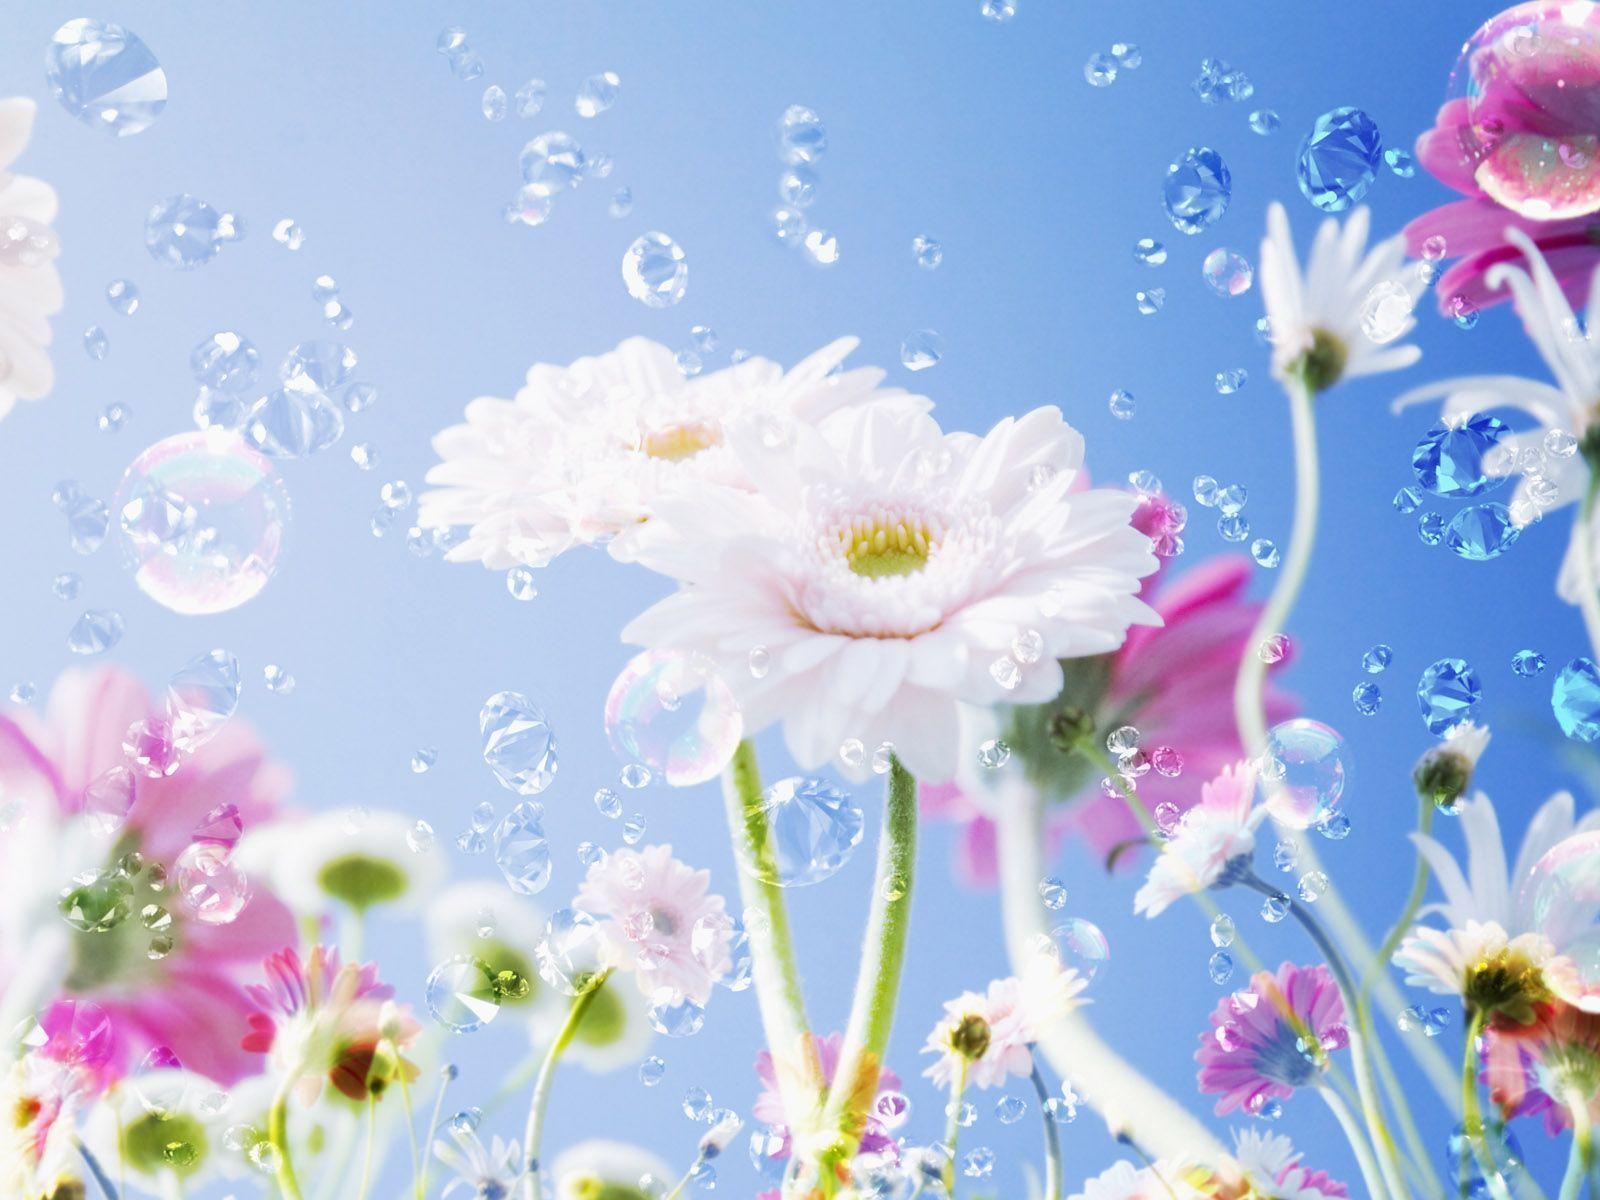 Beautiful flowers wallpapers wallpaper cave wallpapers for beautiful flowers wallpaper desktop izmirmasajfo